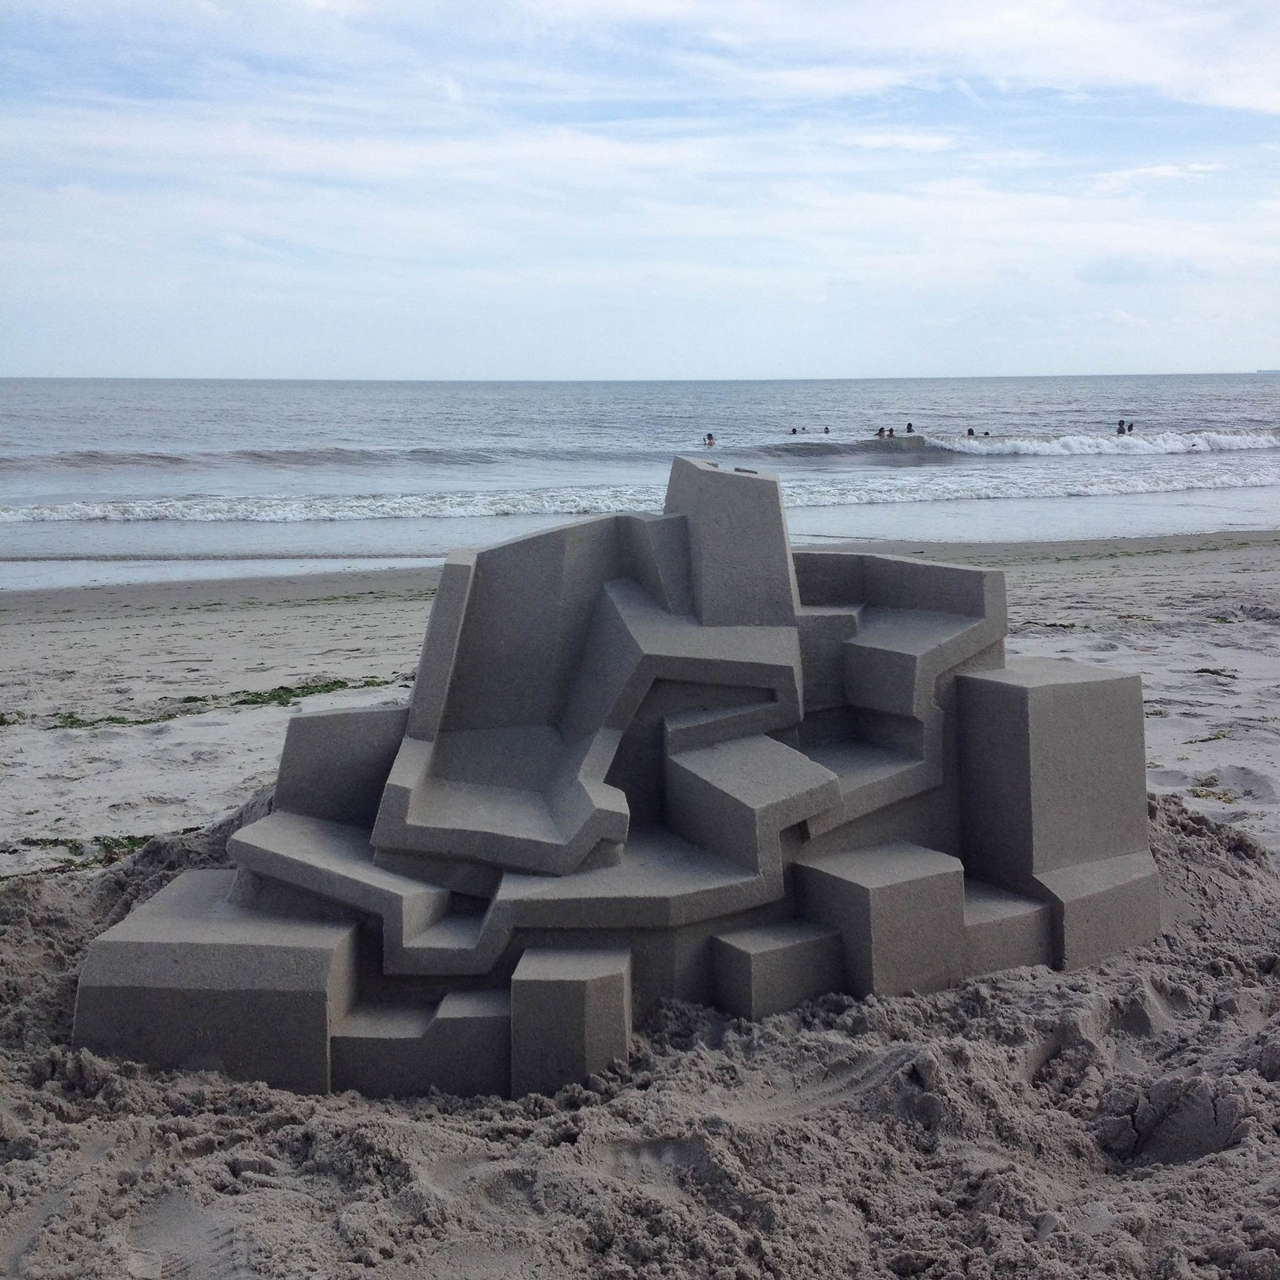 sand-castles-09